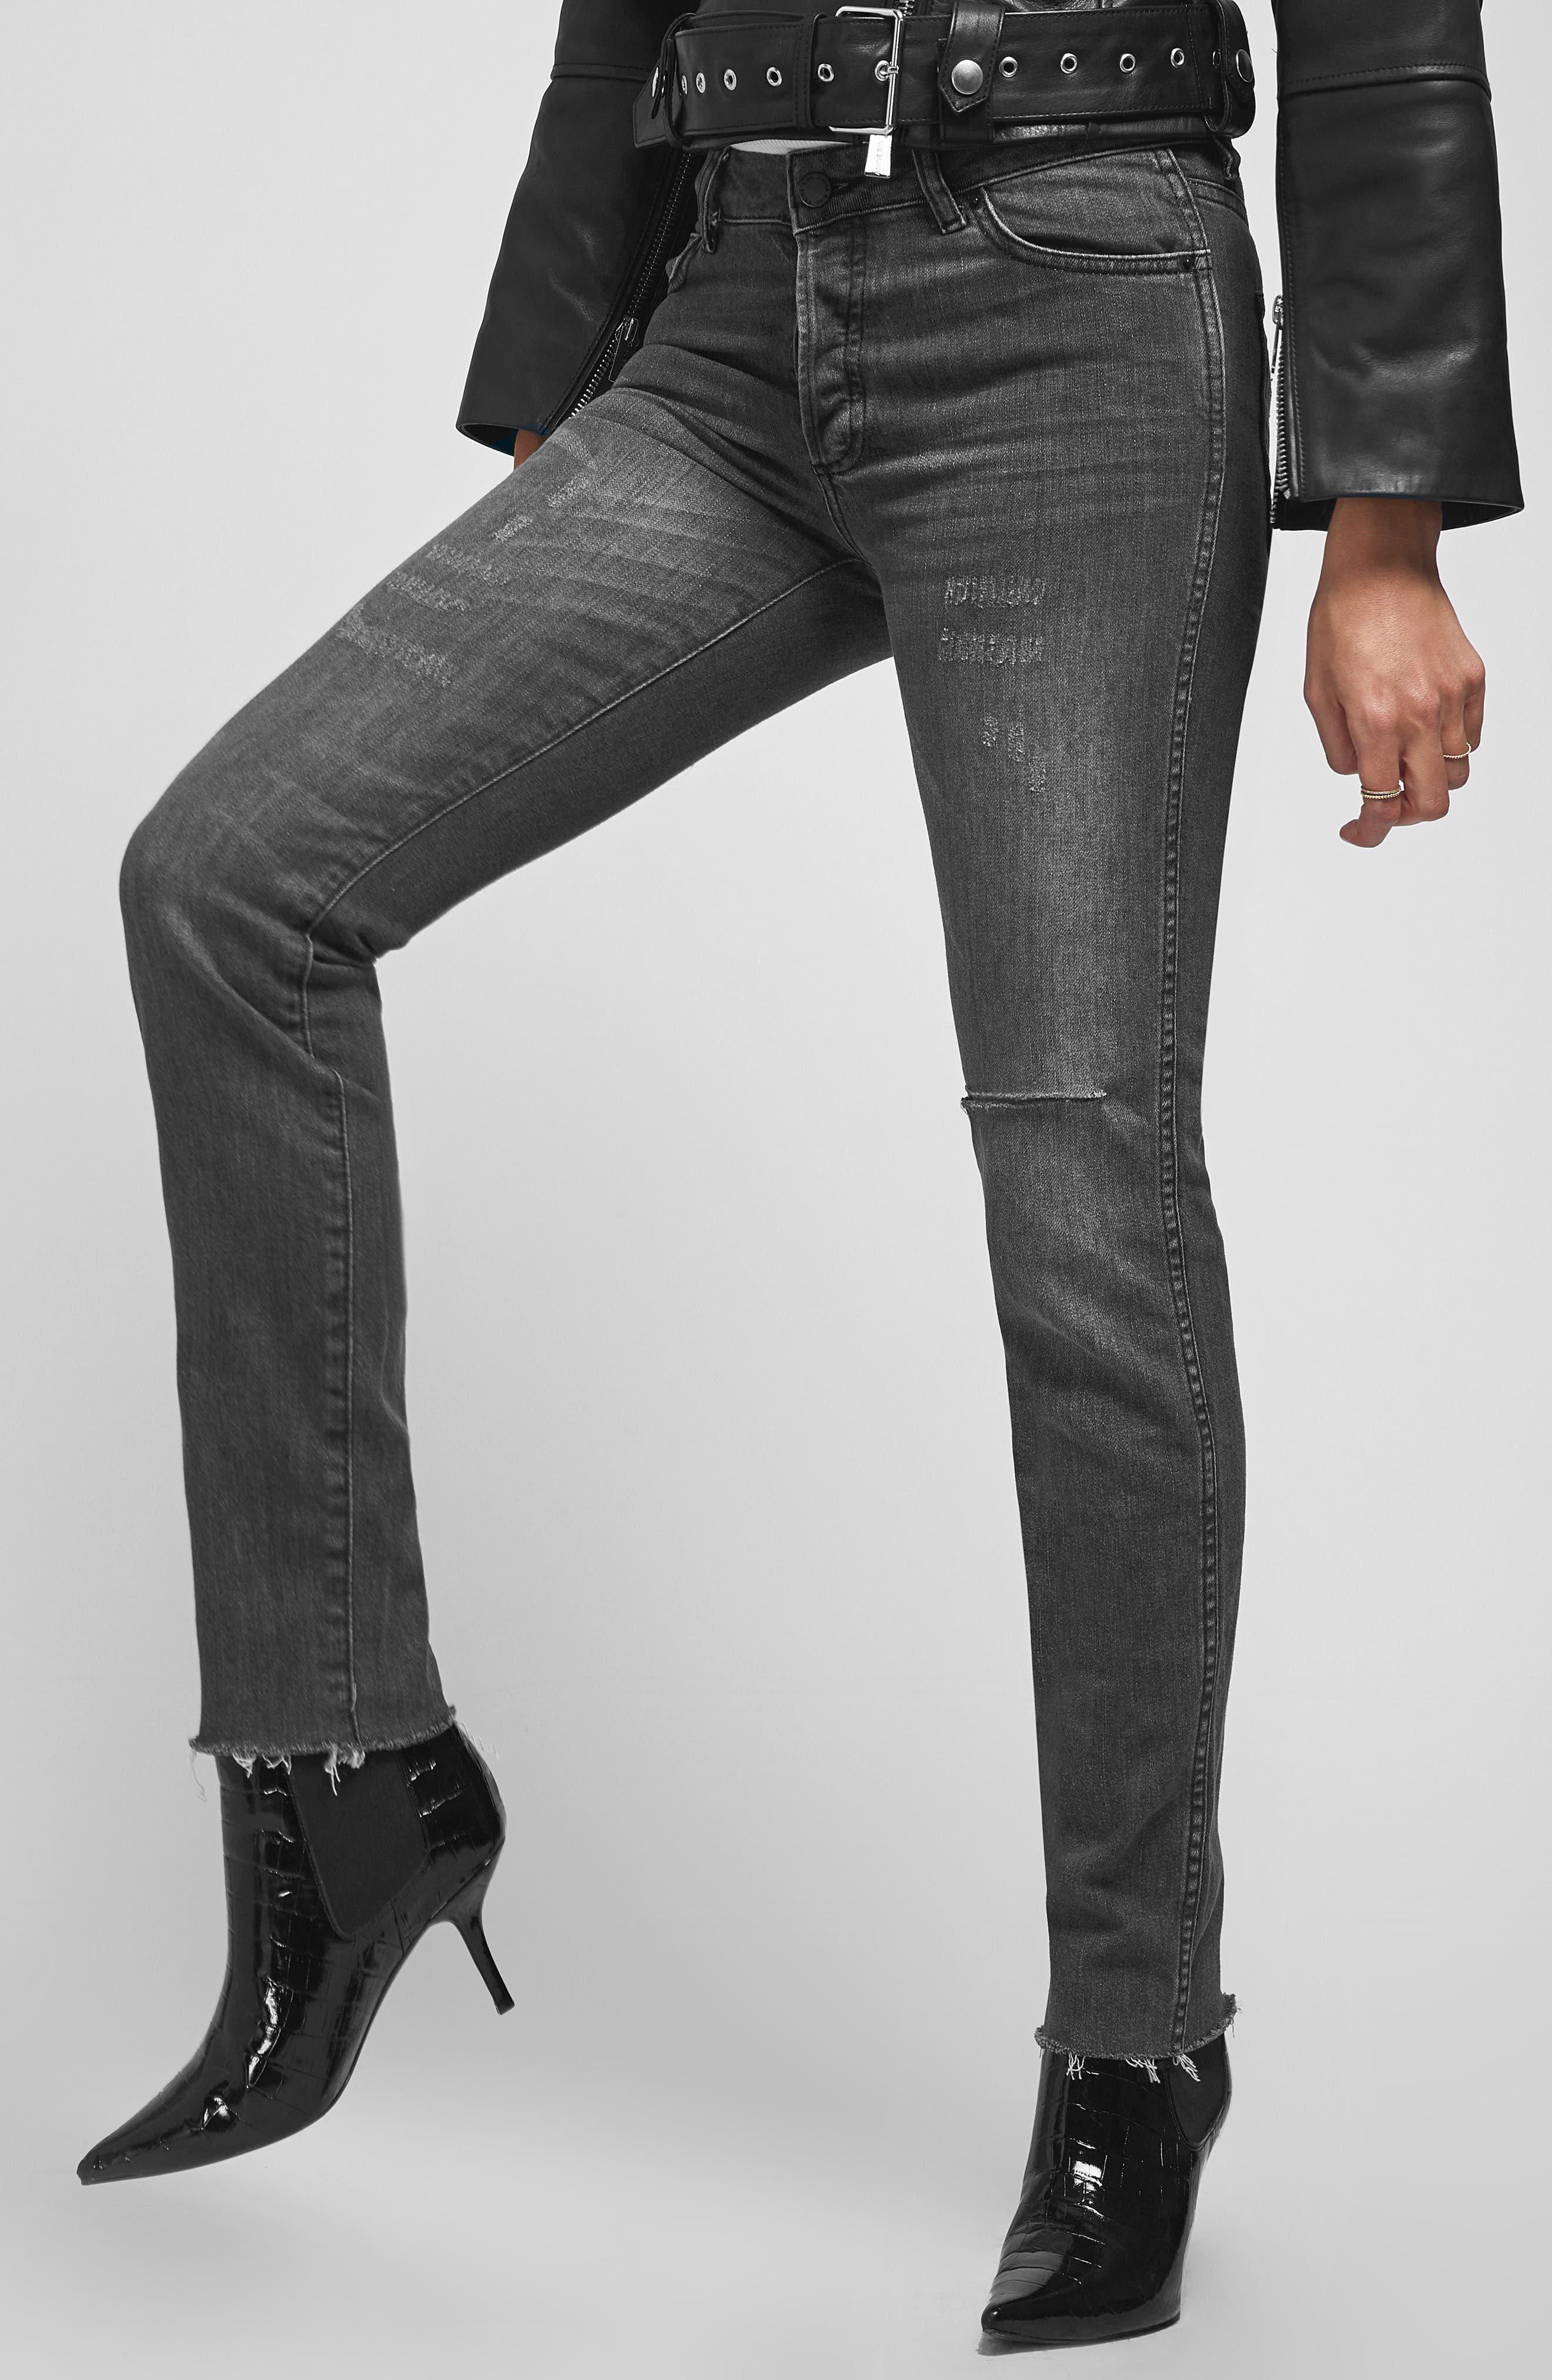 Kara Skinny Jeans,                             Alternate thumbnail 3, color,                             CHARCOAL